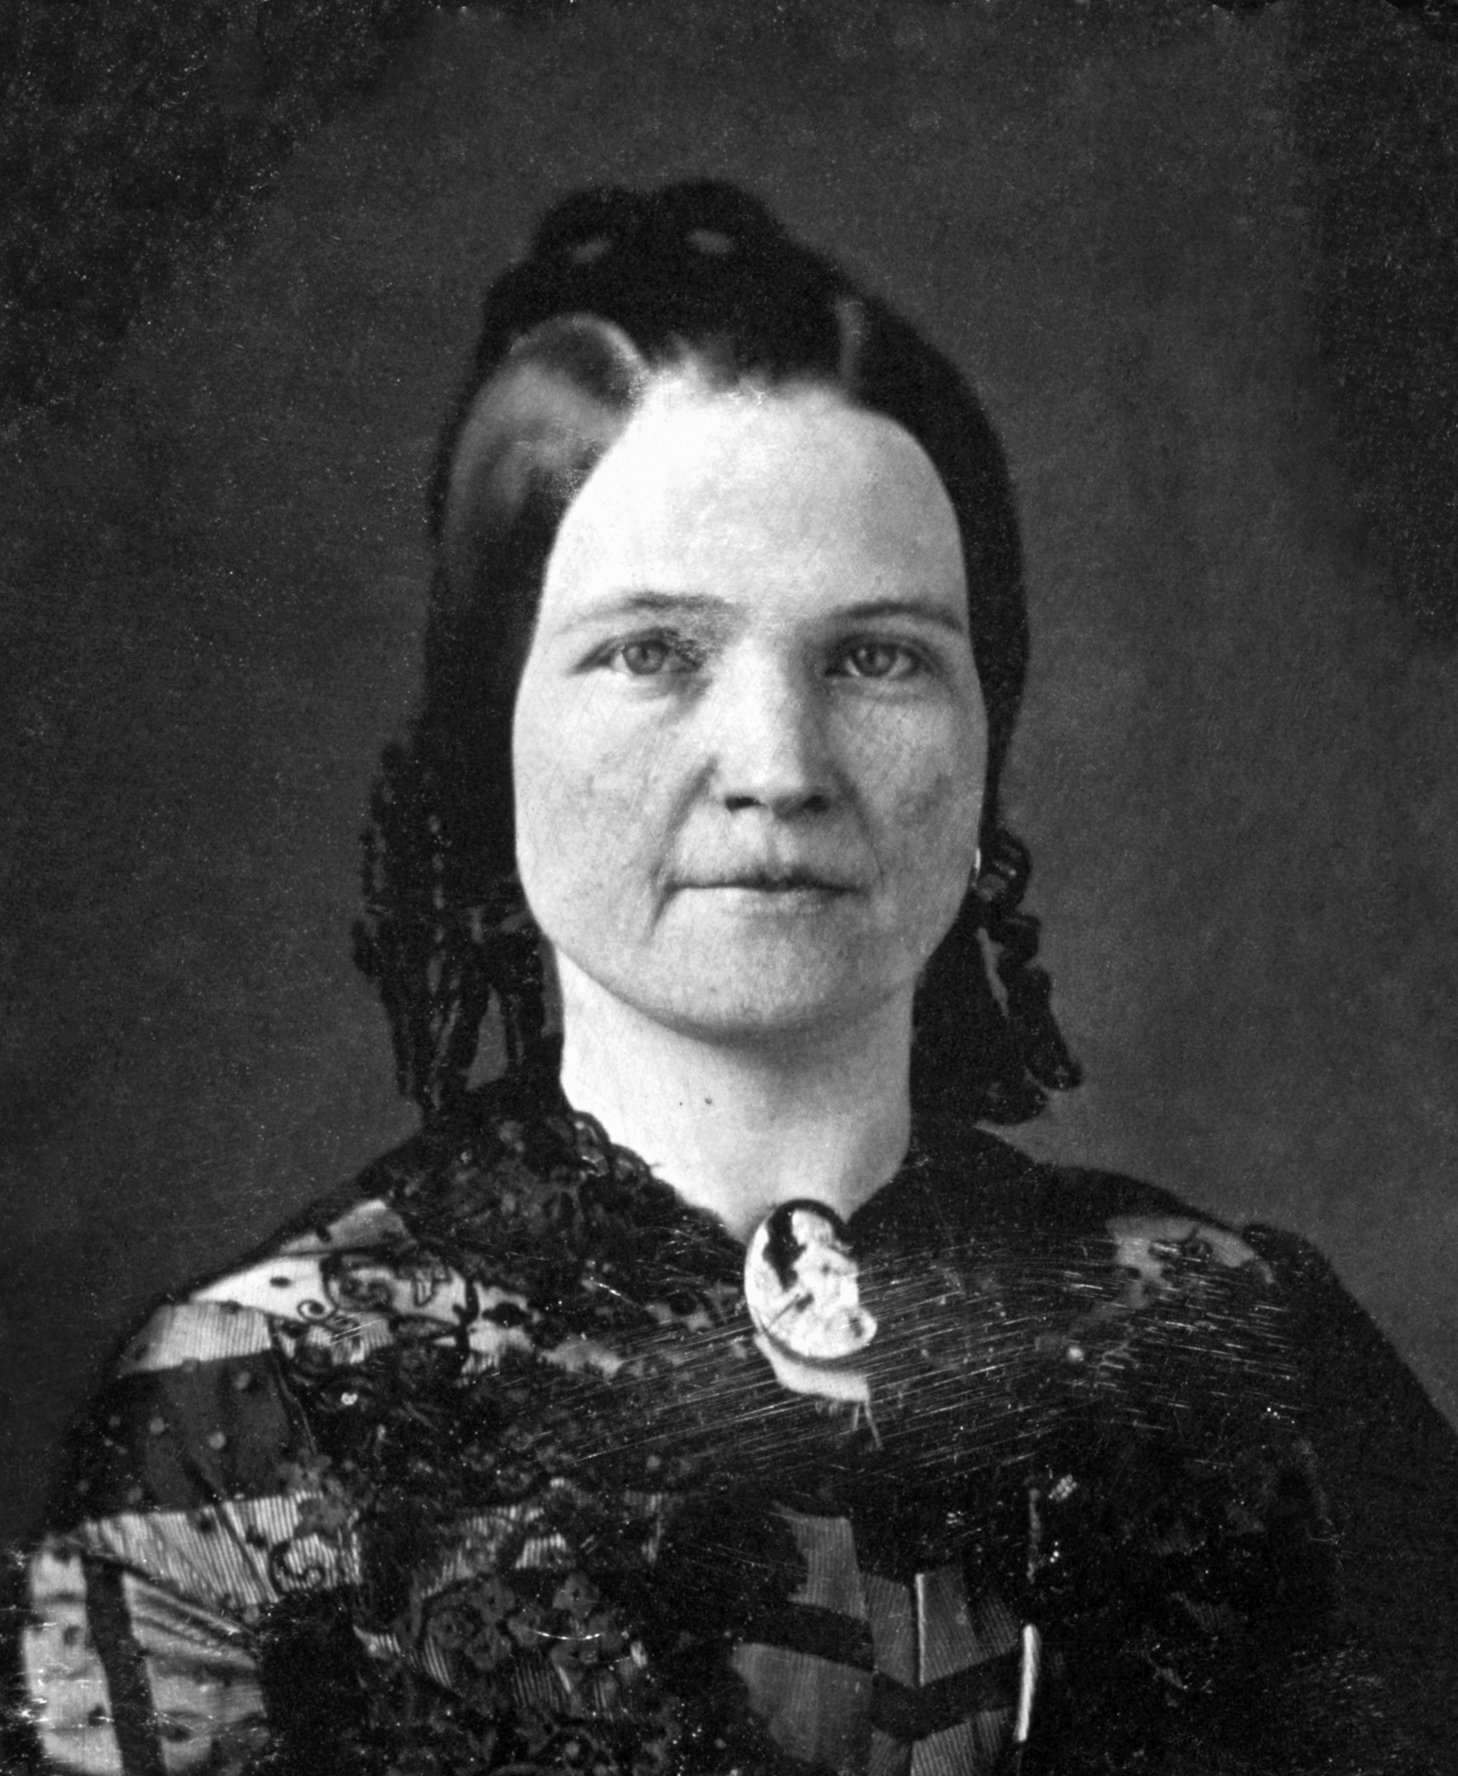 Мэри Тодд, жена Авраама Линкольна.